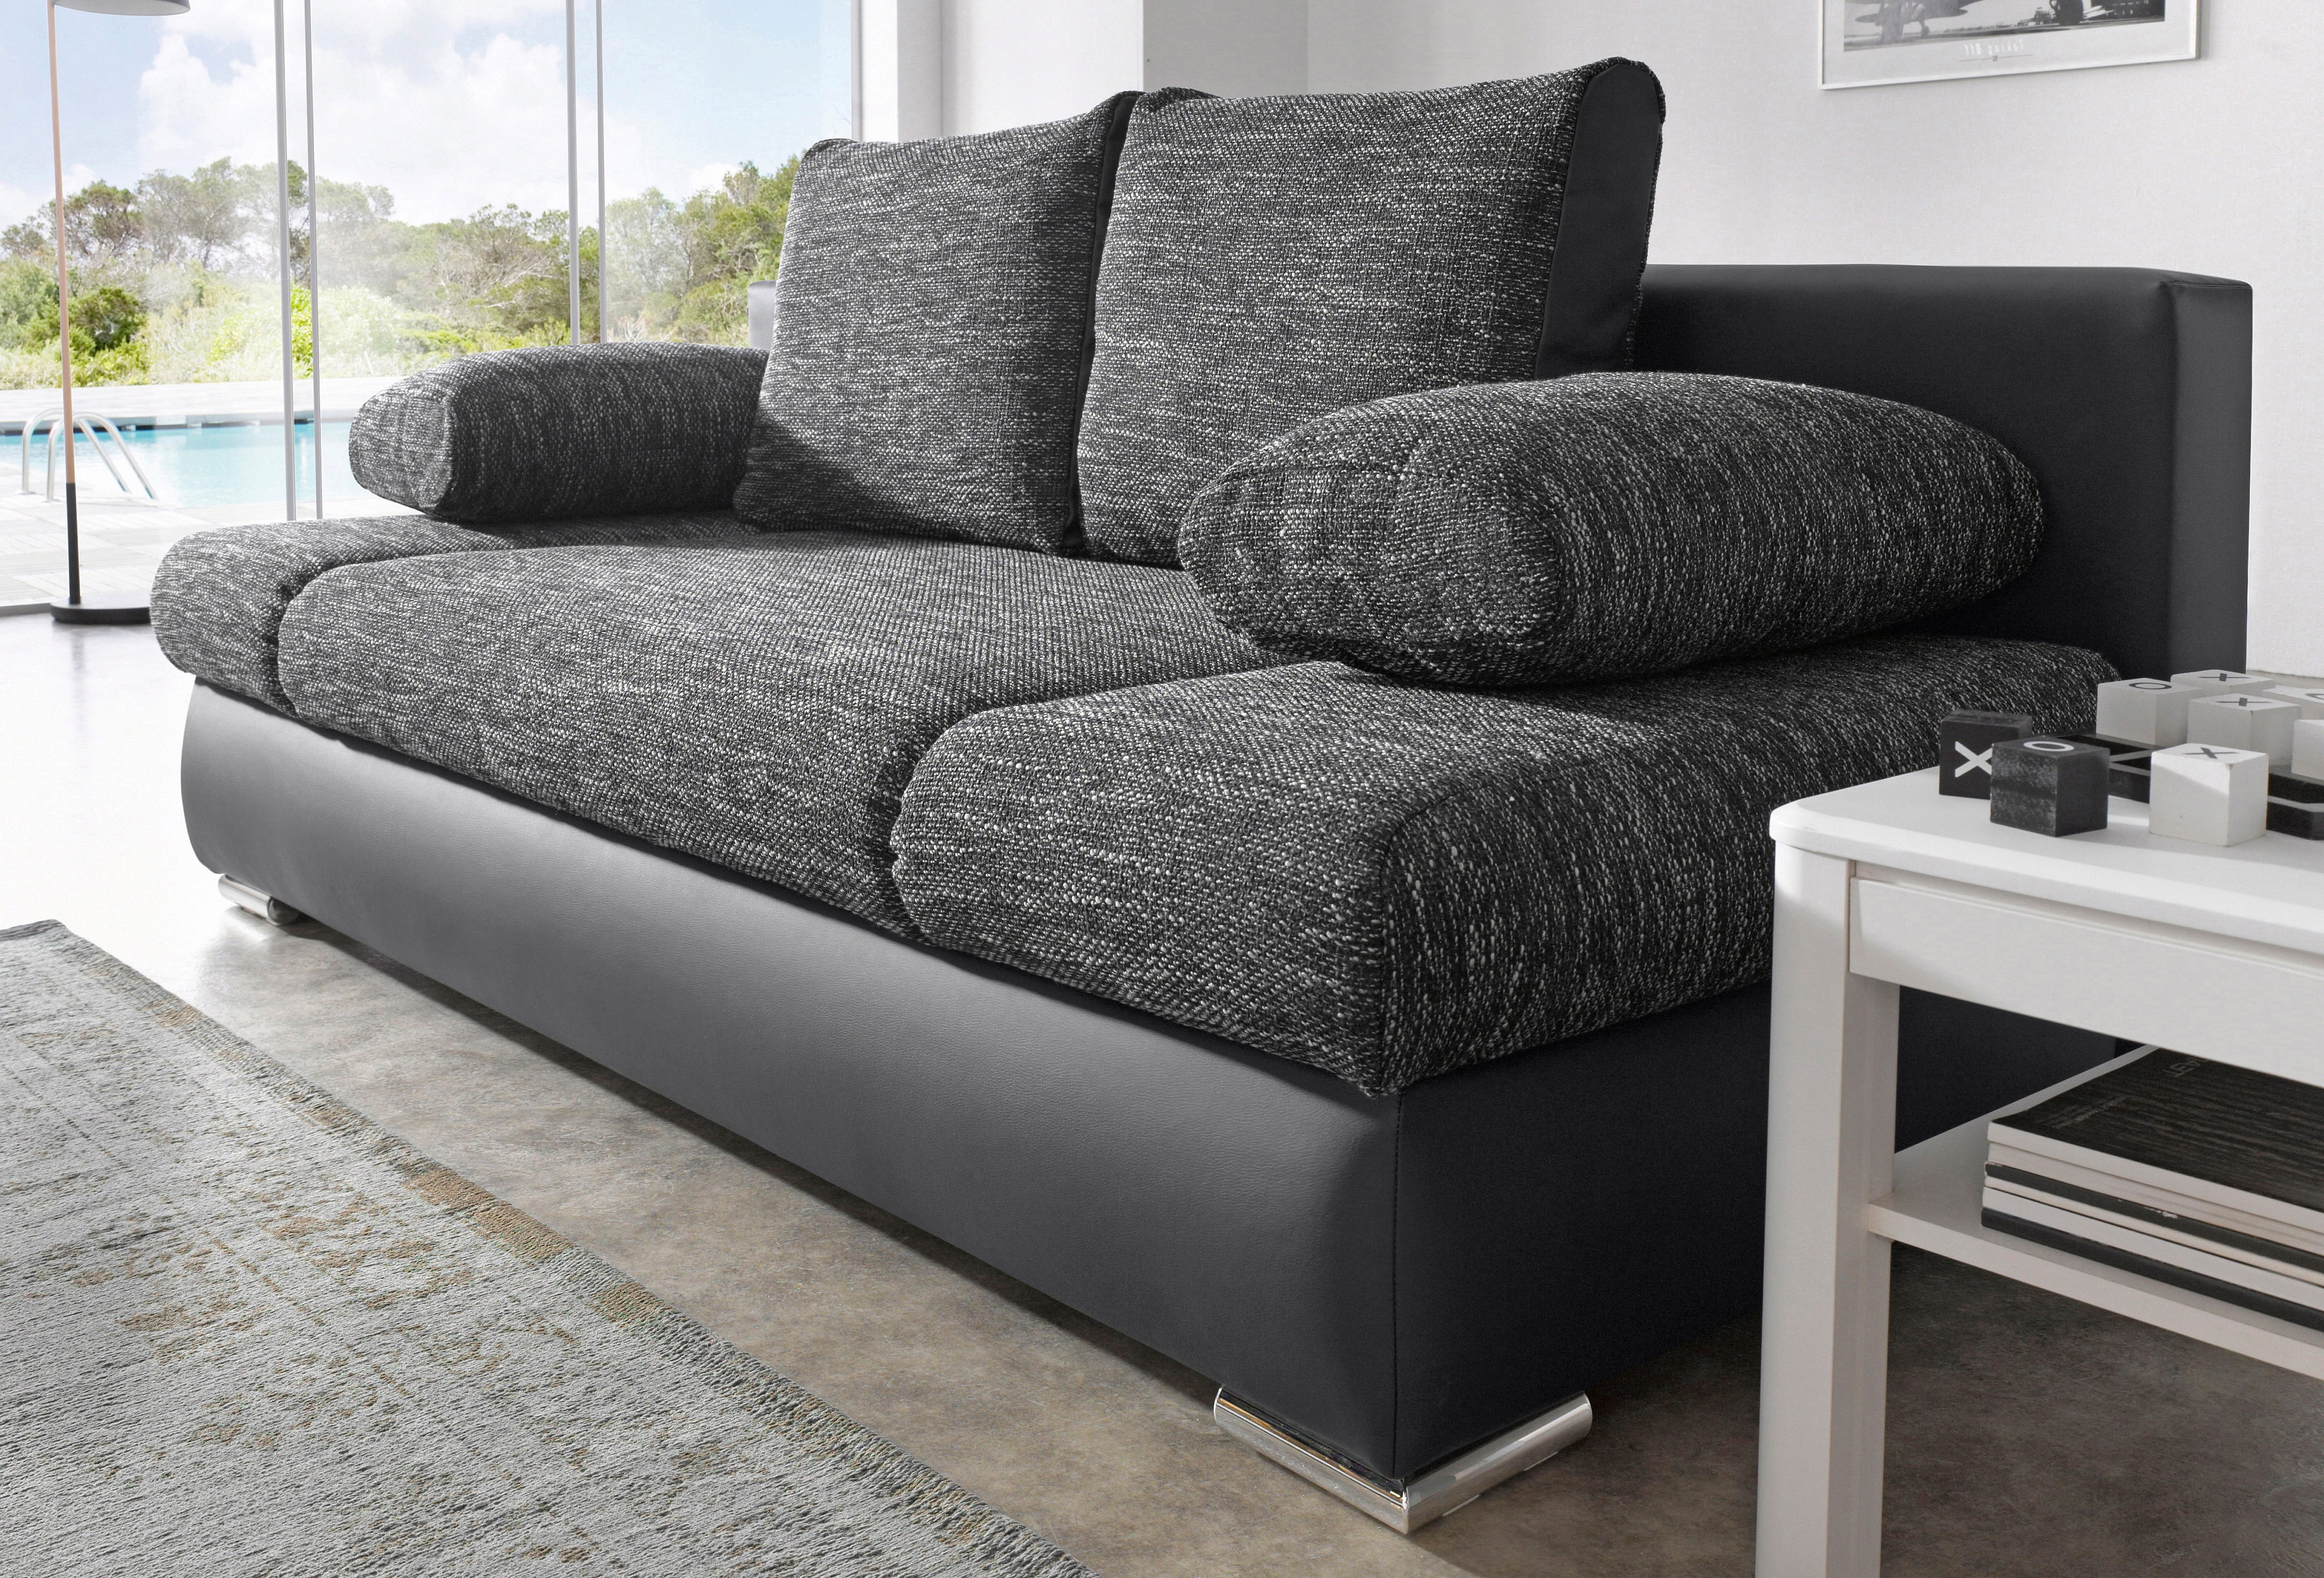 collection ab schlafsofa kaufen bei otto. Black Bedroom Furniture Sets. Home Design Ideas